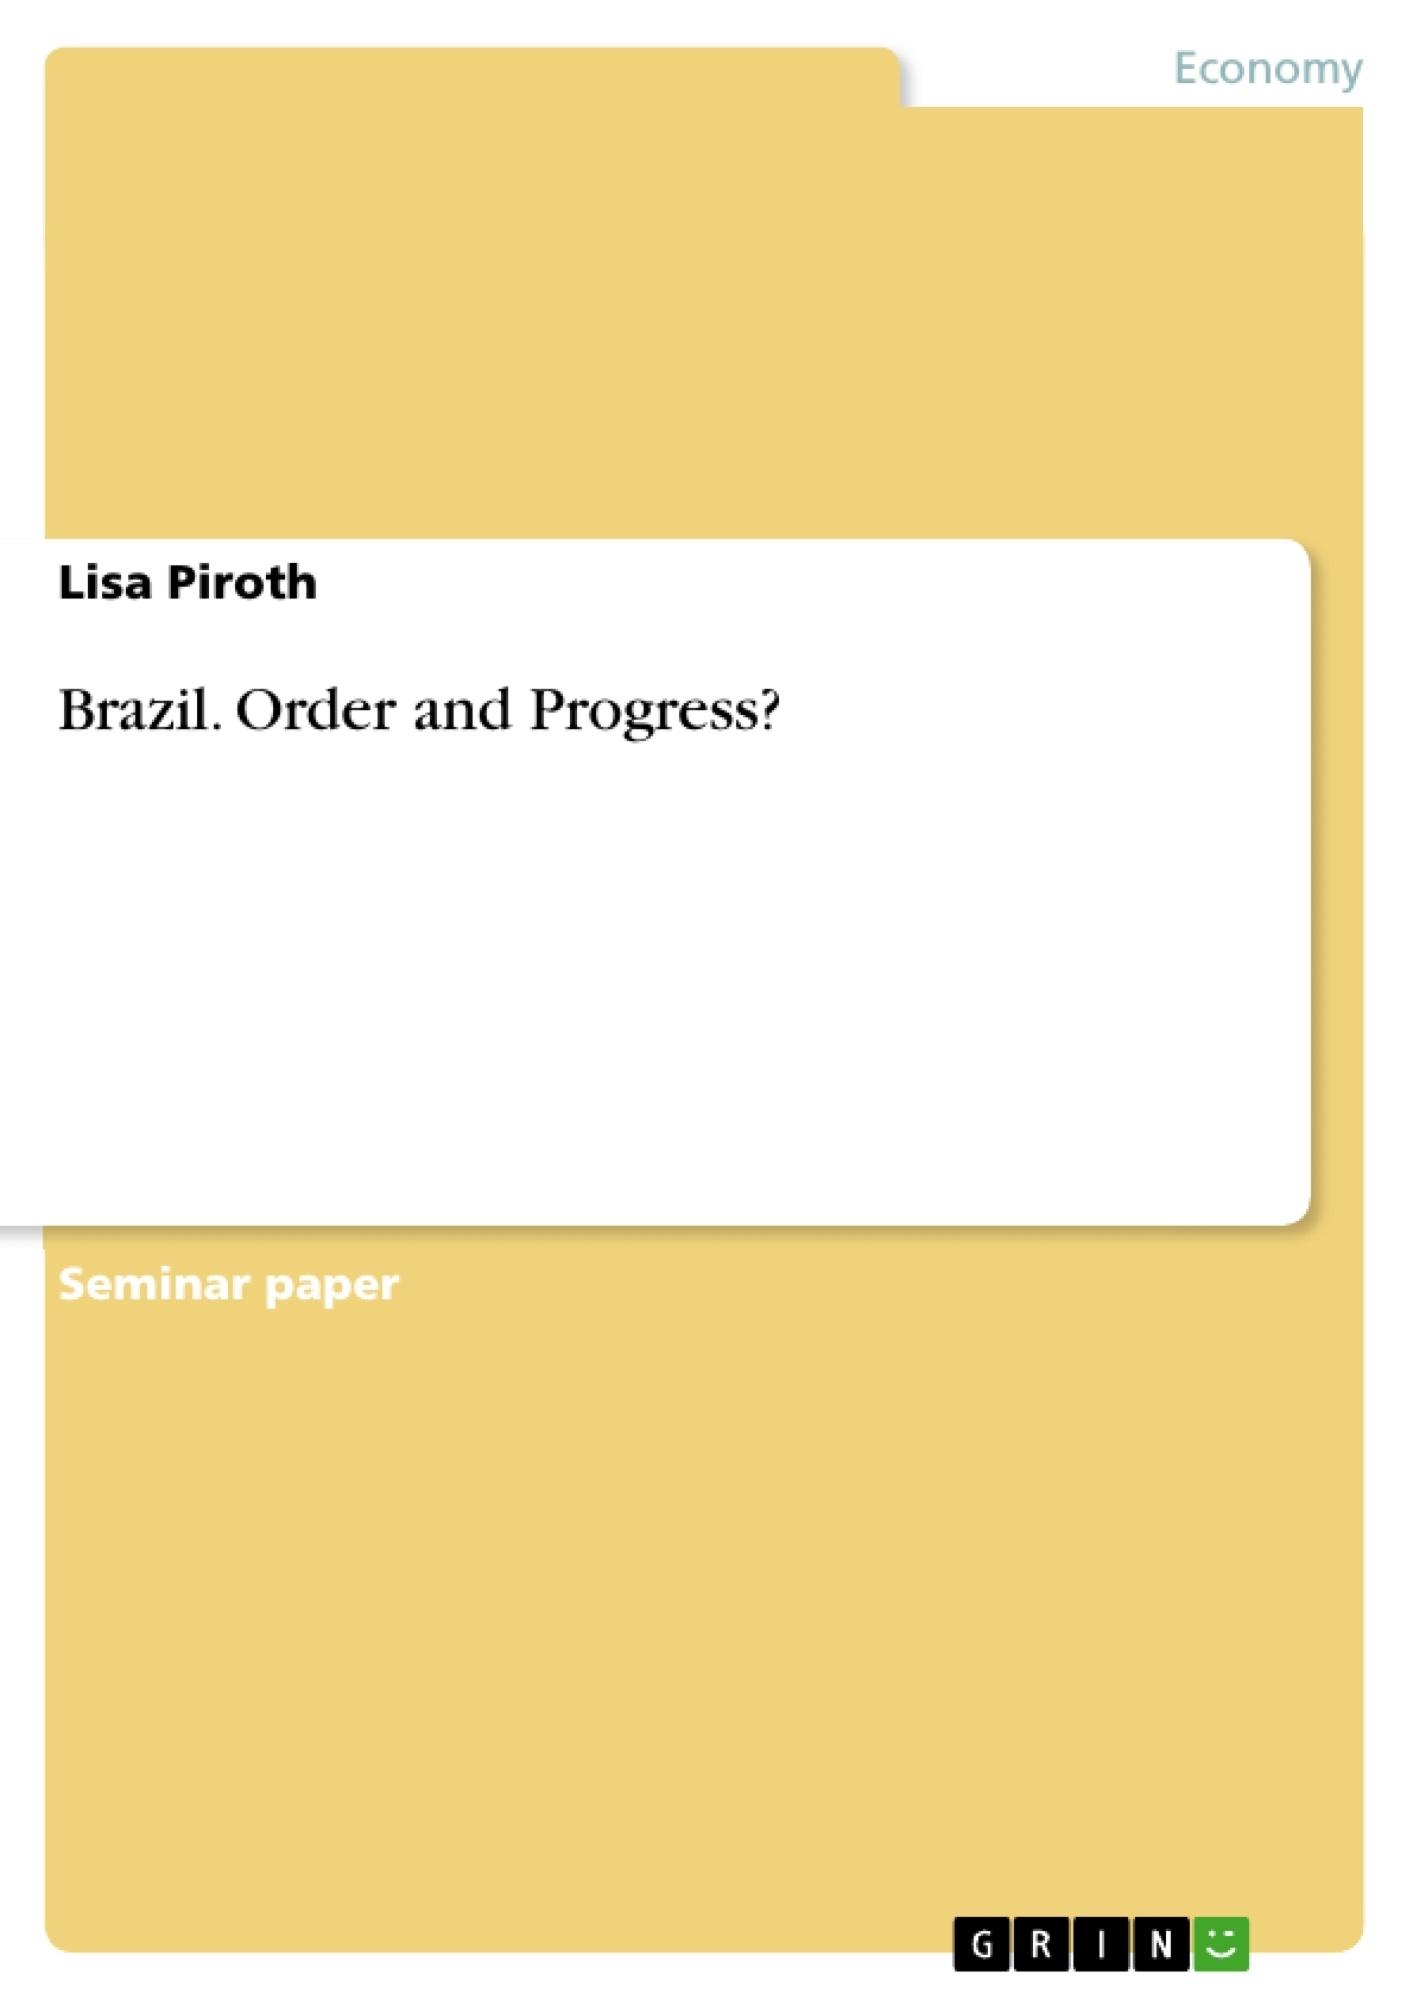 Title: Brazil. Order and Progress?